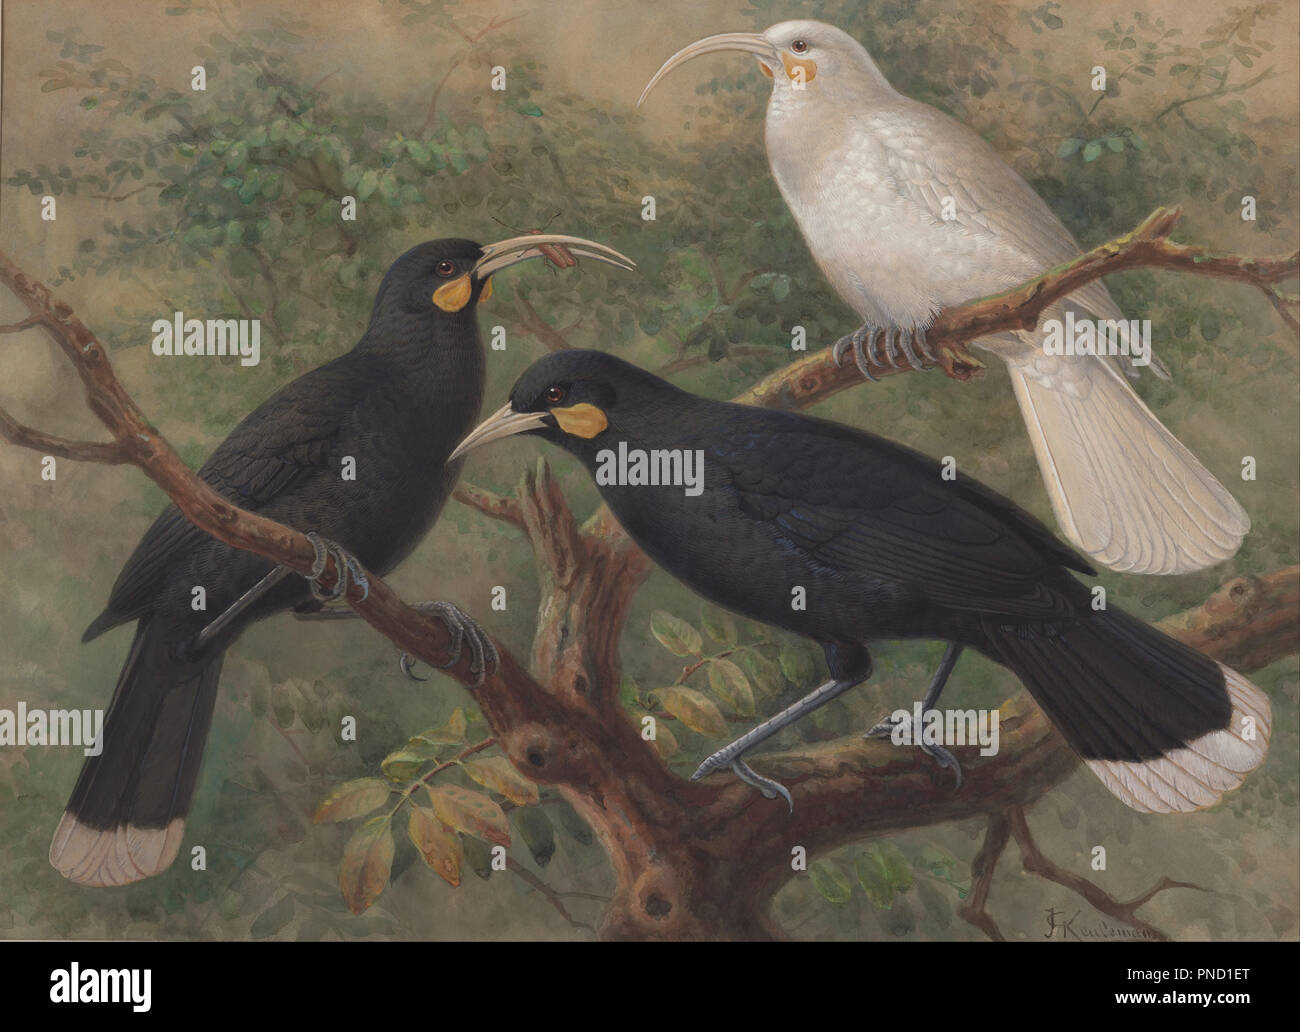 Tre Huia (Heteralocha acutirostris). Data/Periodo: ca. 1900. Acquerelli. Acquarello e tempera. Altezza: 529 mm (20.82 in); larghezza: 724 mm (28.50 in). Autore: John Gerrard Keulemans. Foto Stock